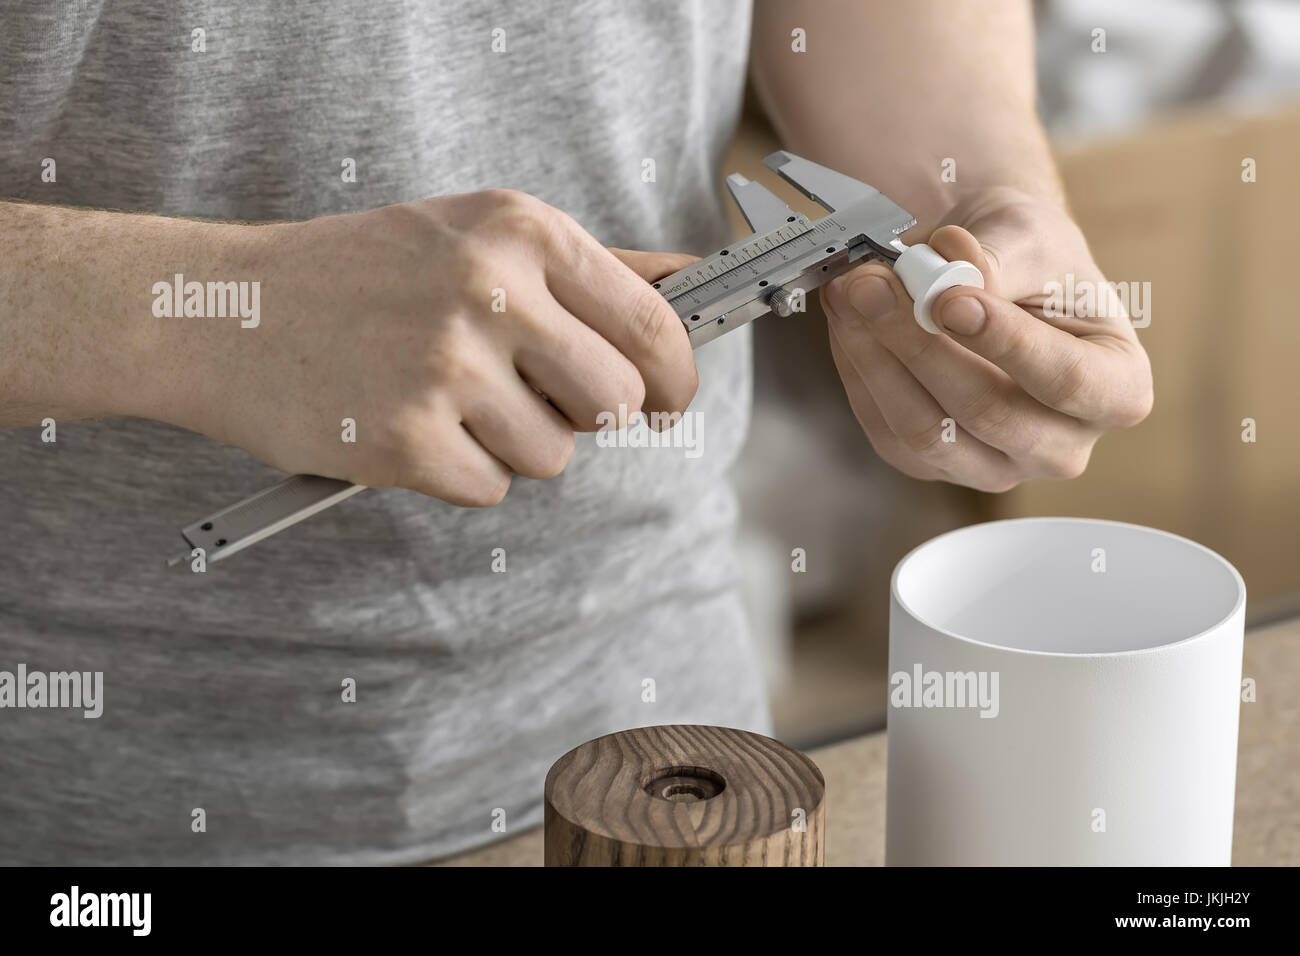 Man using caliper in workshop - Stock Image